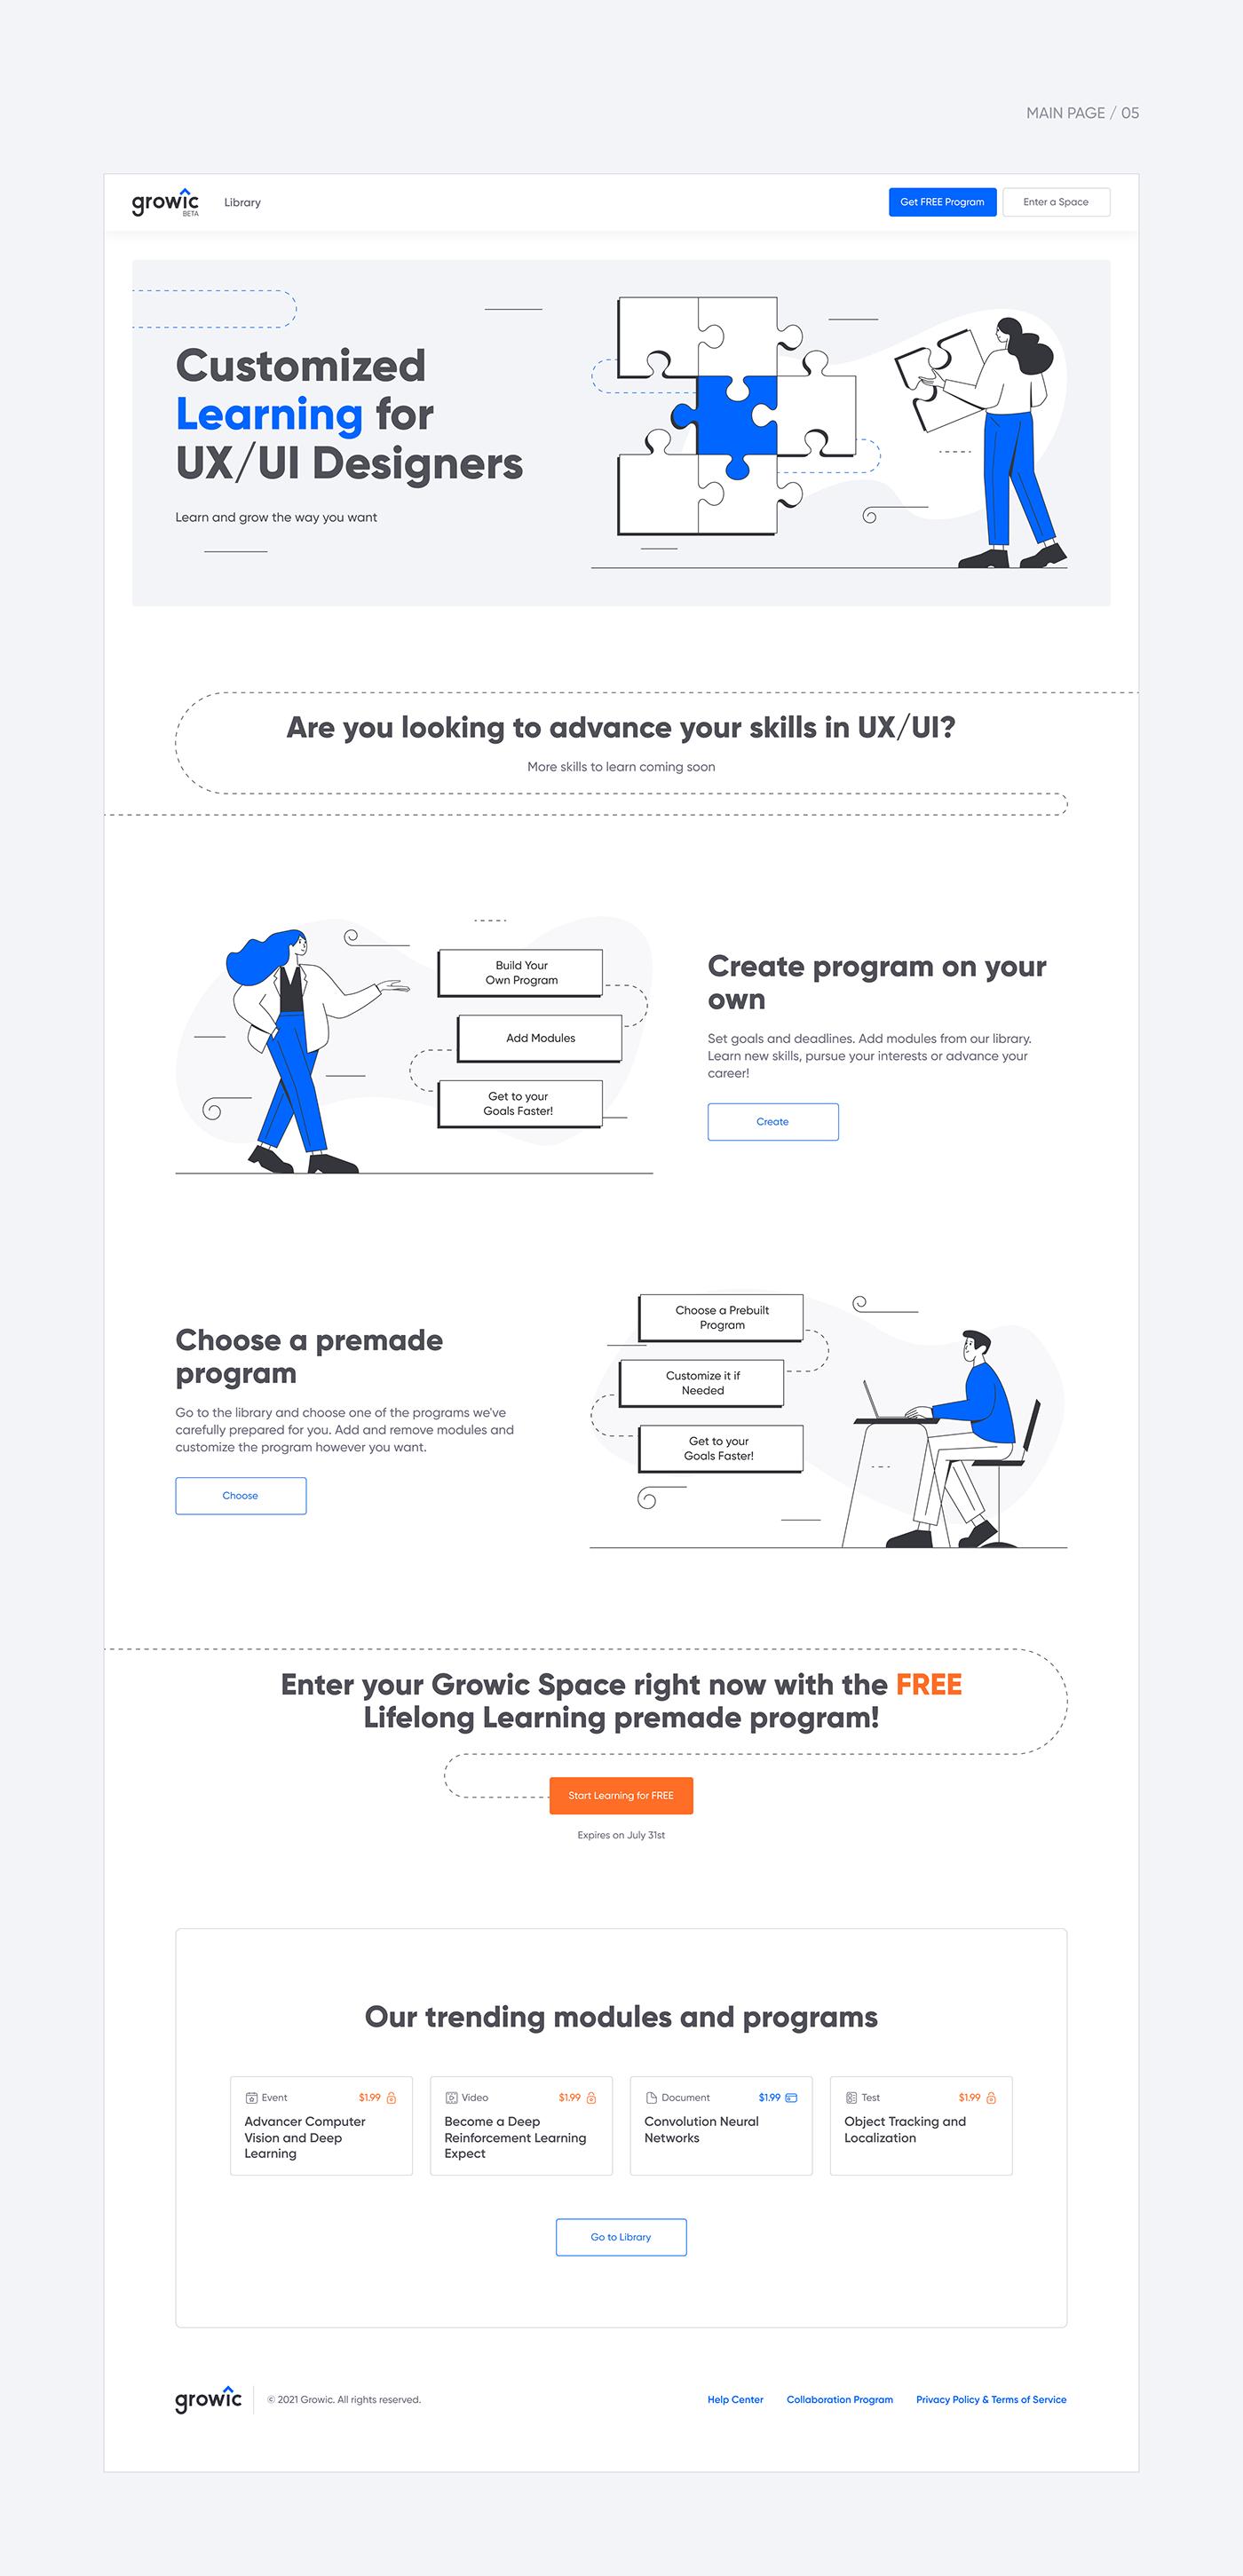 clean eLearning Interface Minimalism mobile UI UI/UX ux Web Design